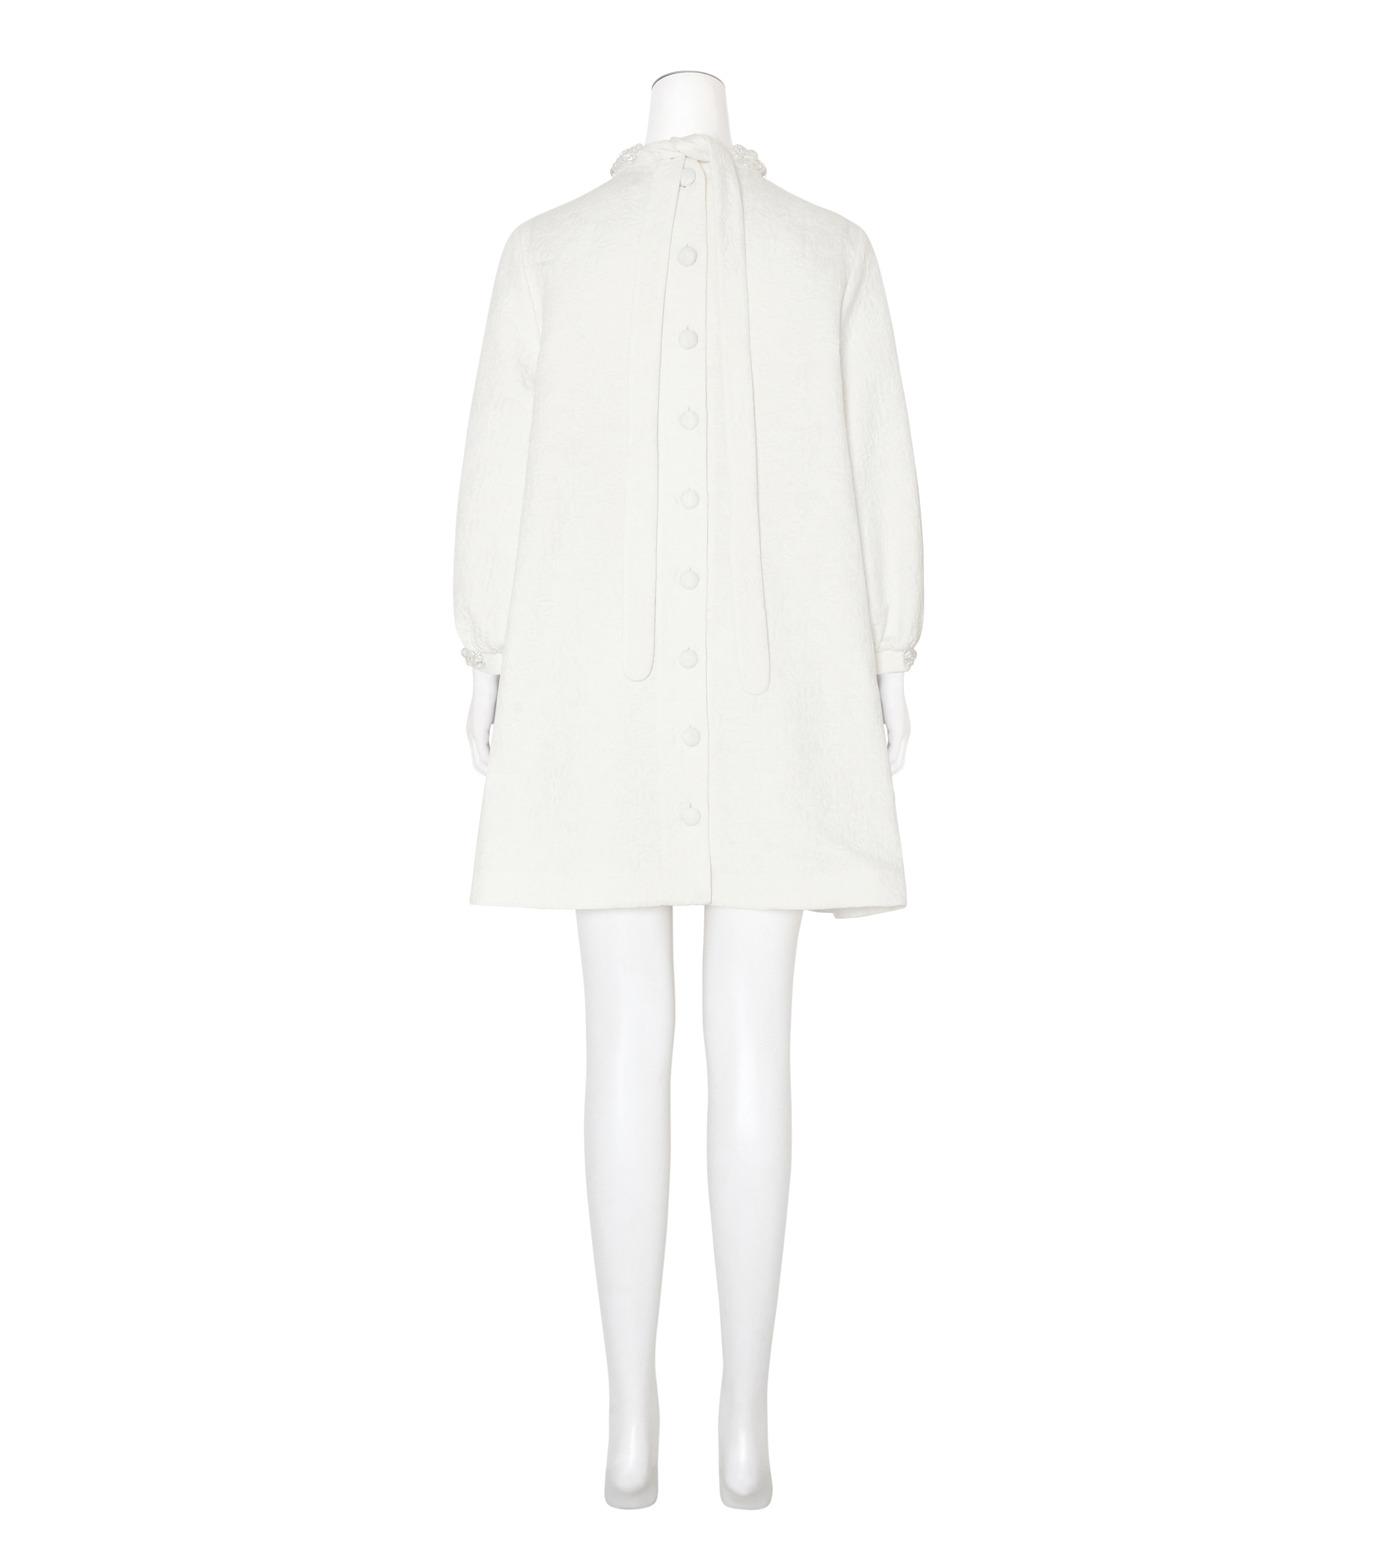 Simone Rocha(シモーネロシャ)のCotton Brocade Tunic Dress w/Beads-WHITE(ワンピース/one piece)-3750B-5 拡大詳細画像2